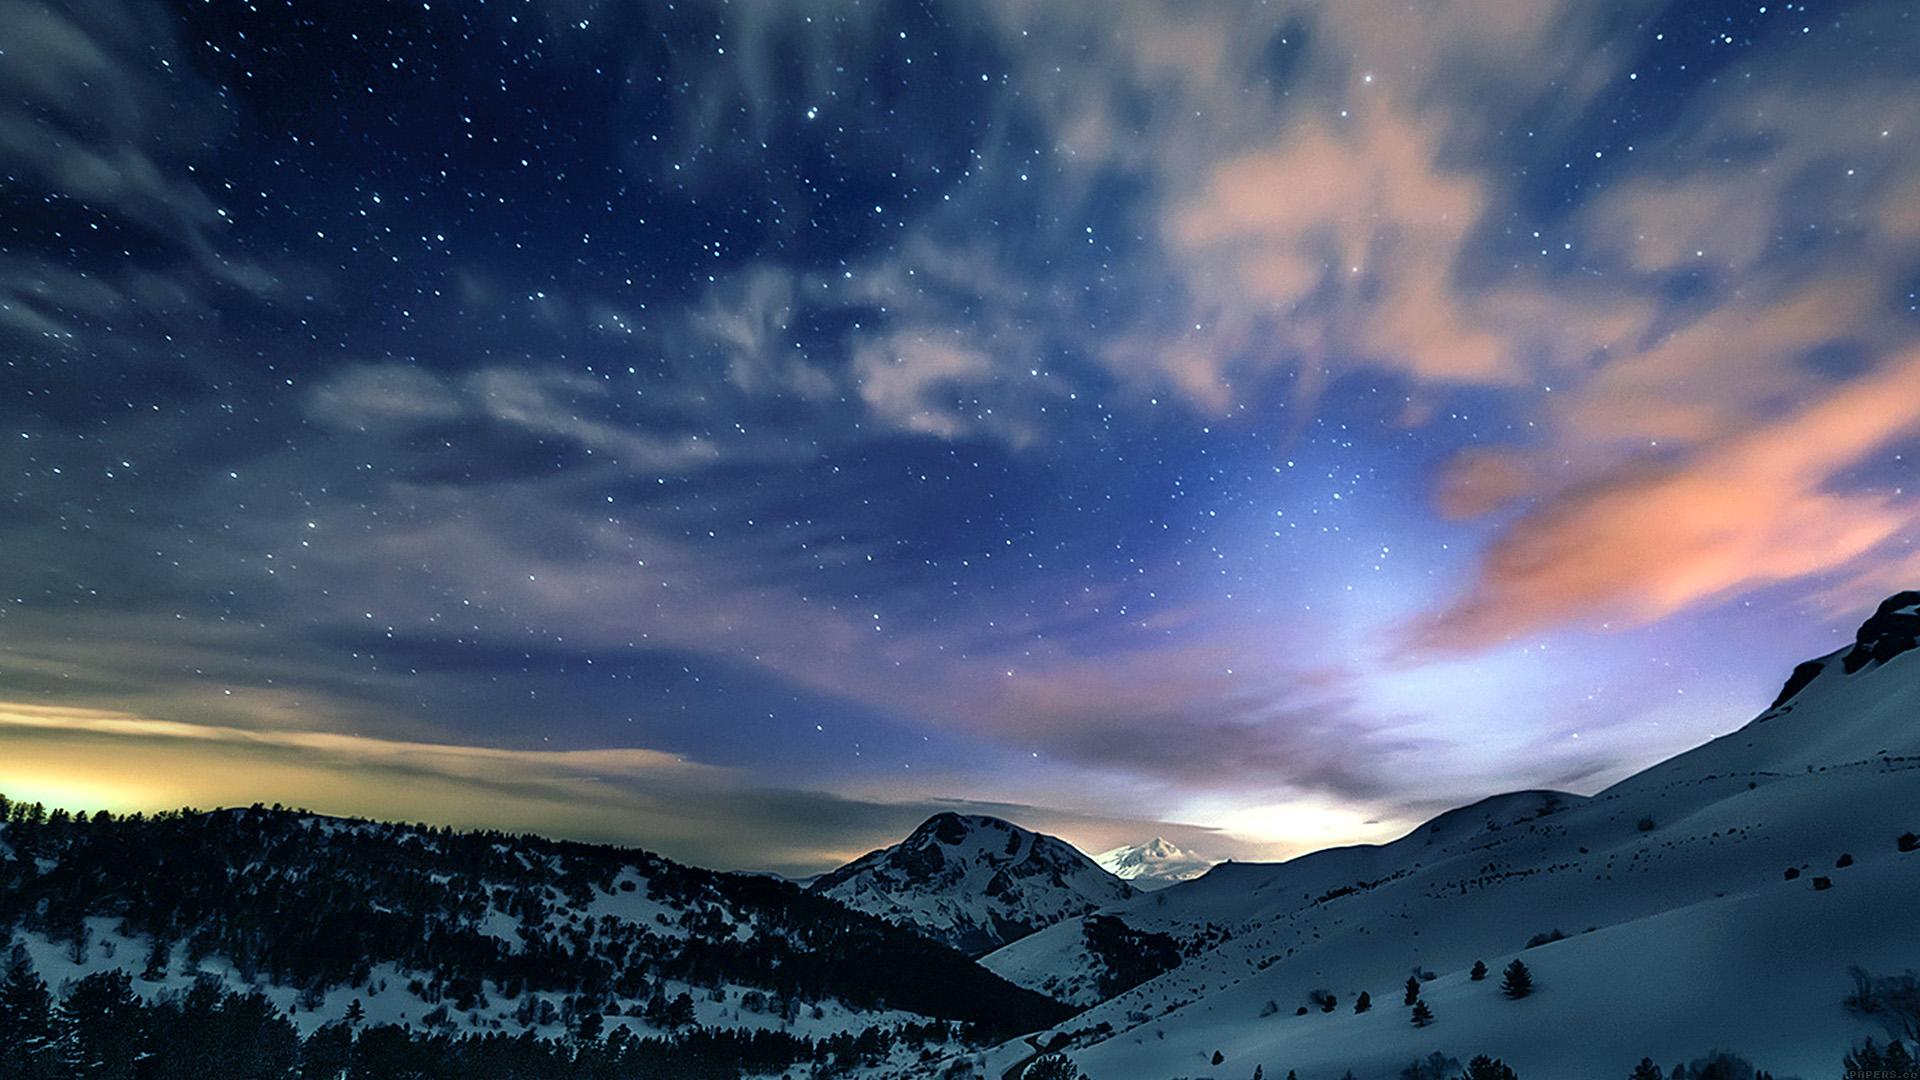 Free Fall Flower Desktop Wallpaper Mk78 Aurora Star Sky Snow Mountain Winter Nature Papers Co